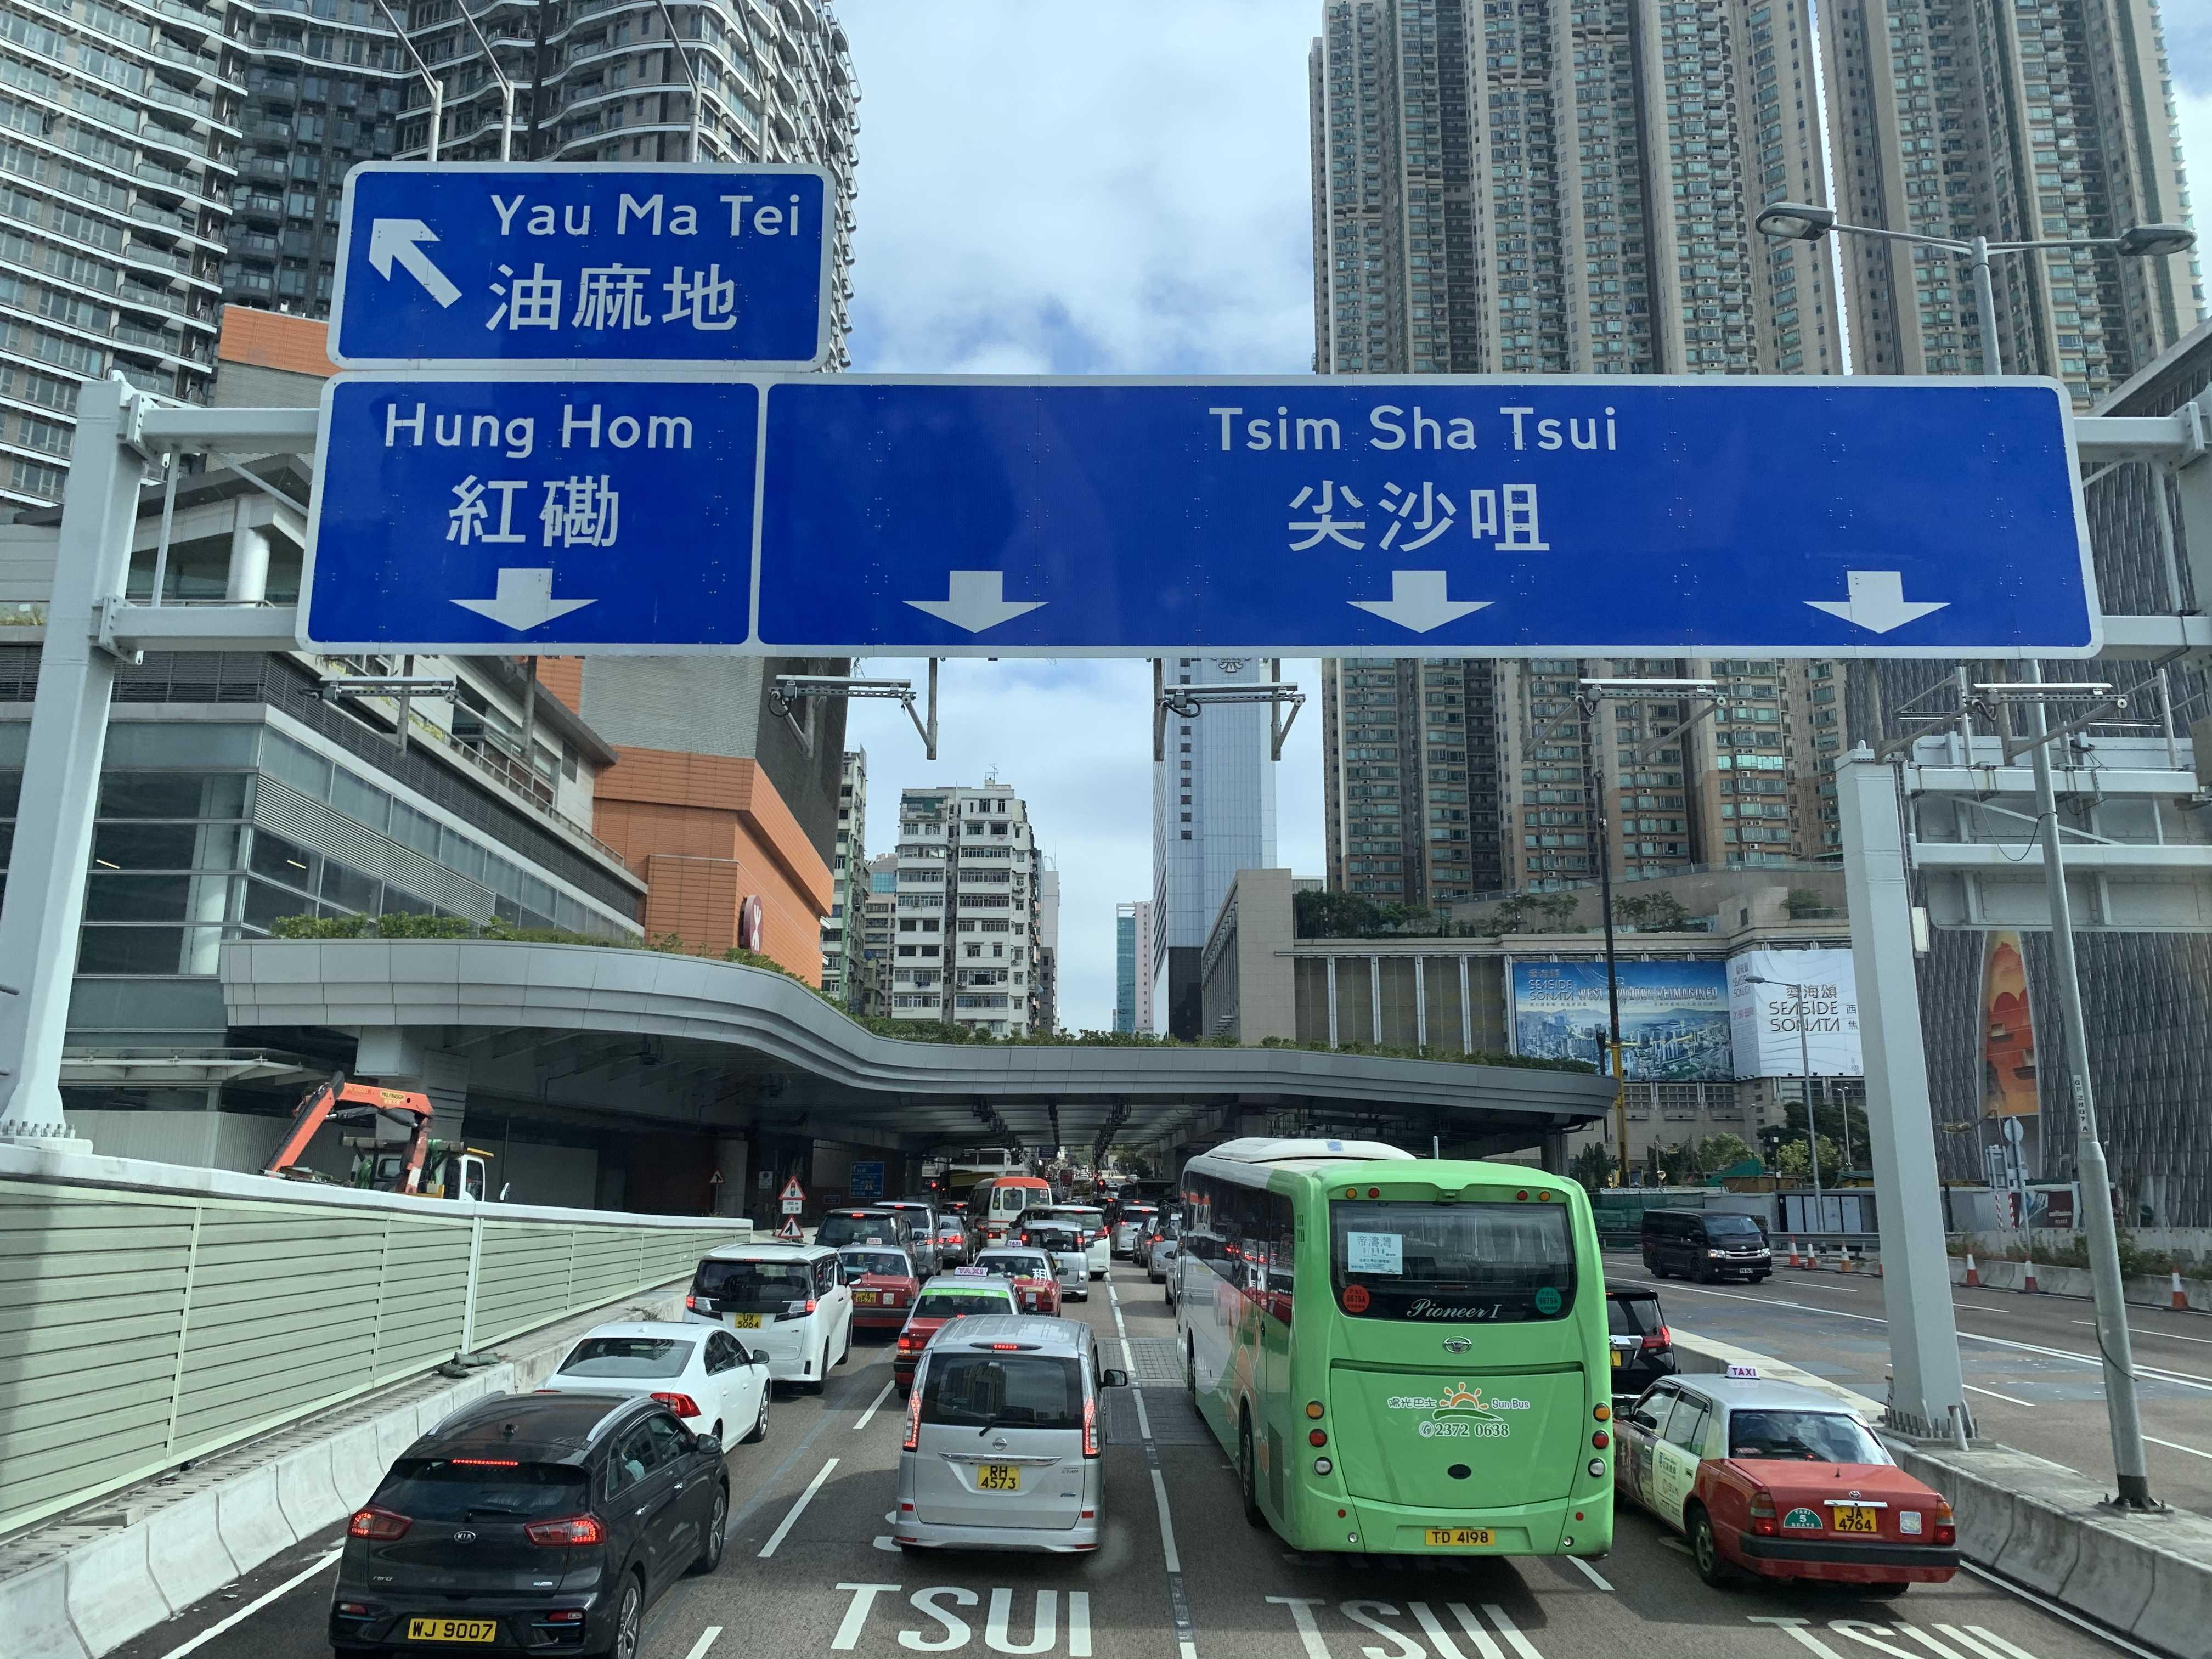 香港旅游-f038896627a2c1437d2dab4c94bfeb1